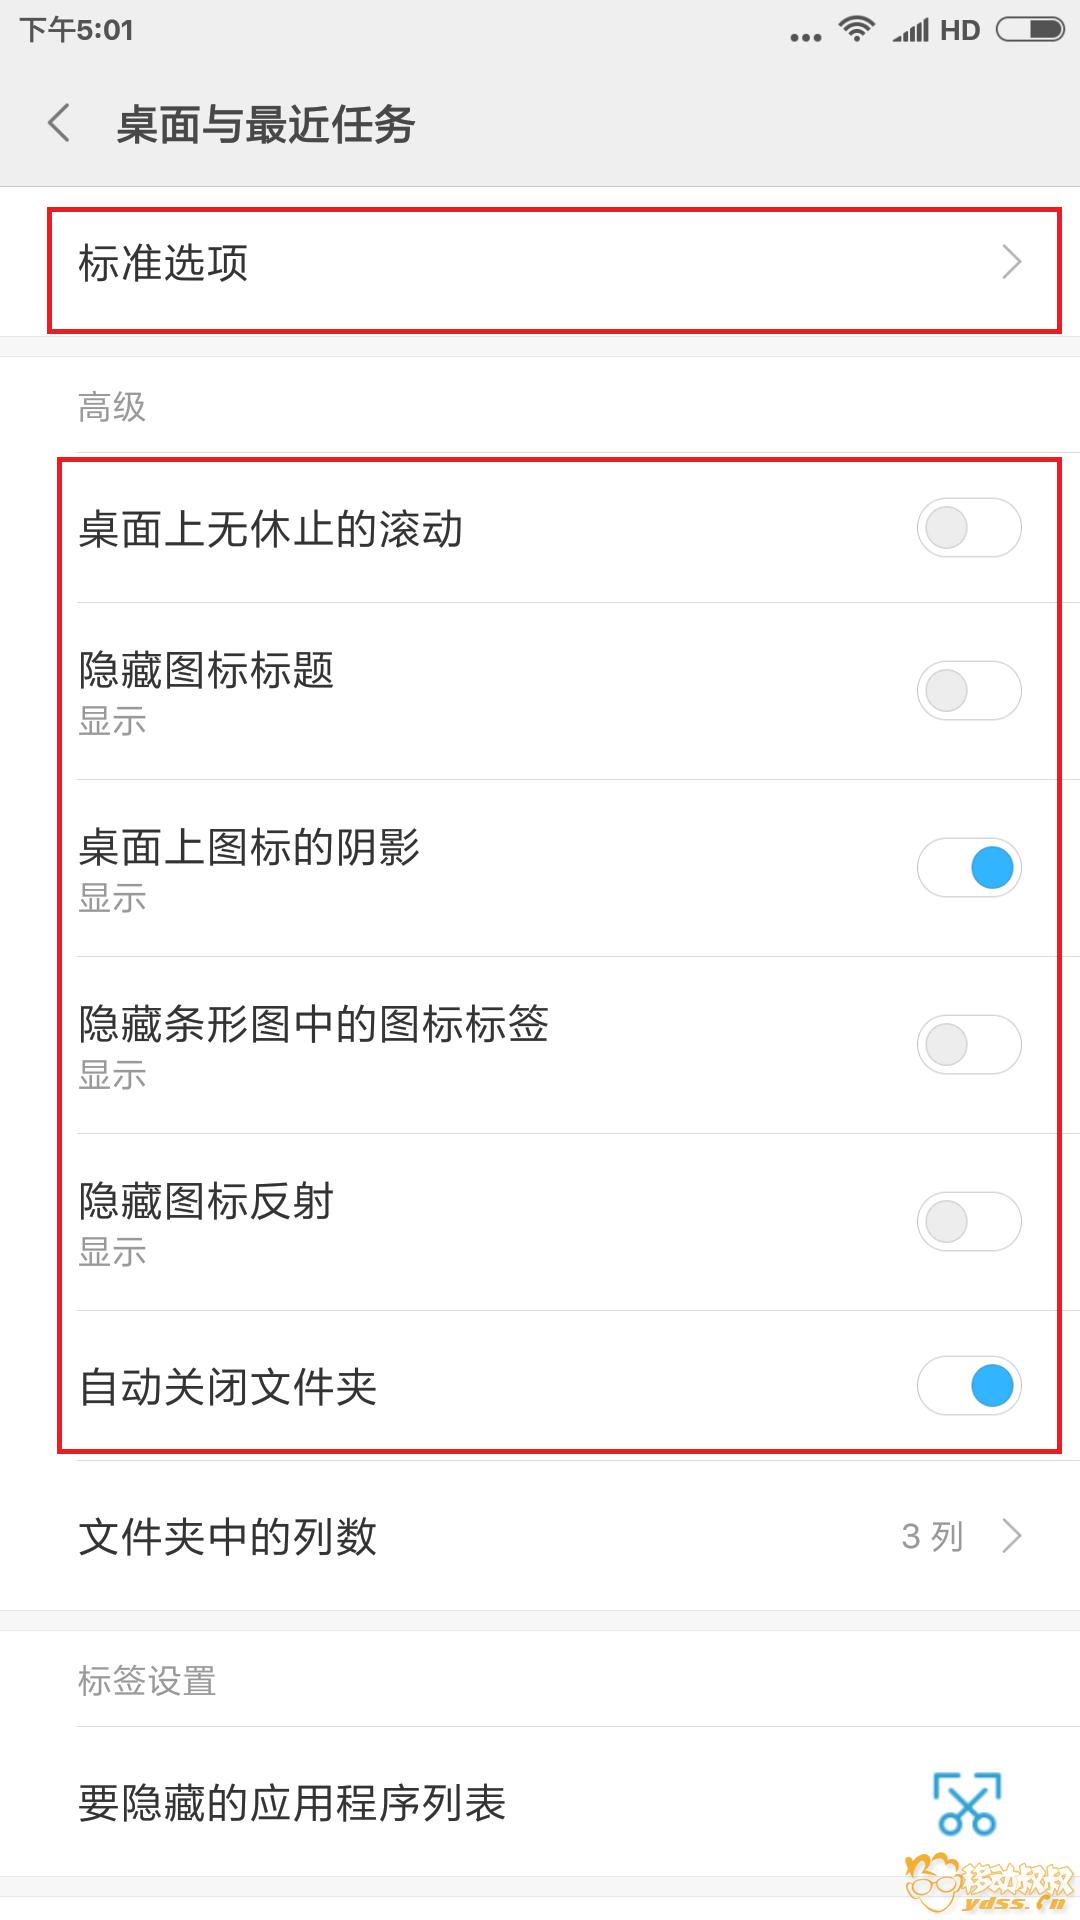 Screenshot_2018-05-19-17-01-25-242_com.android.settings.png